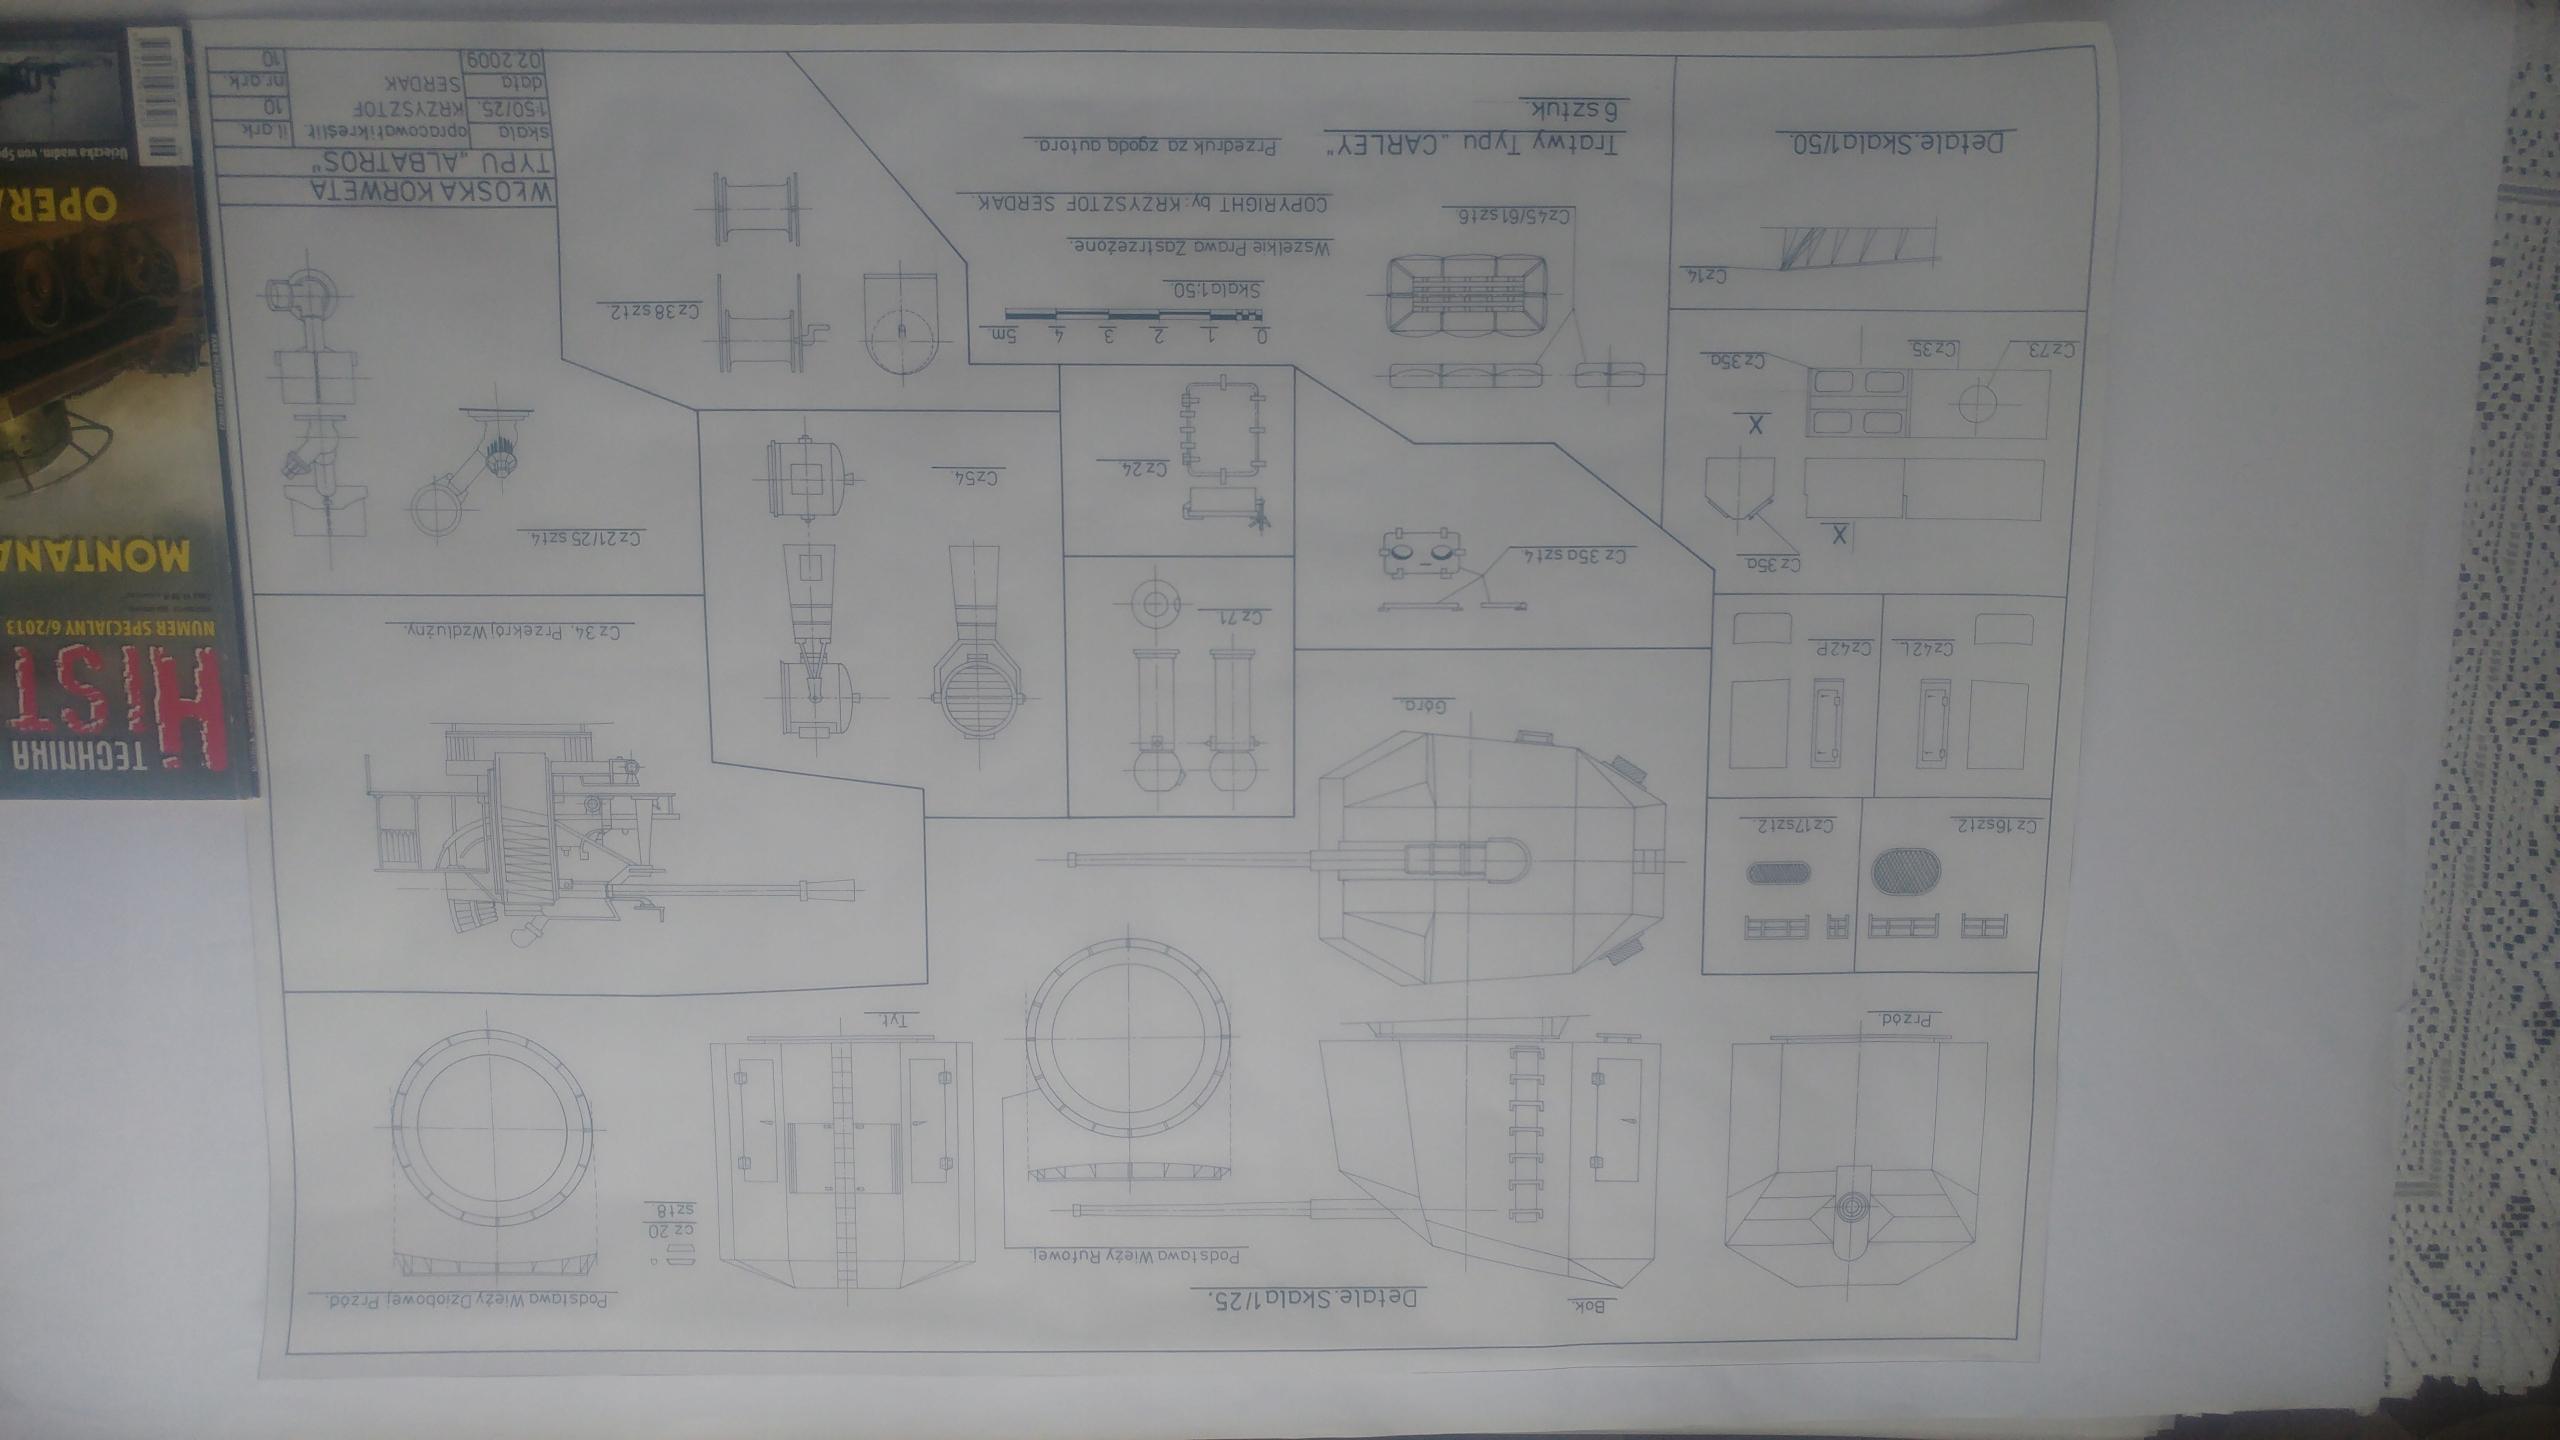 Korweta ALBATROS arkusz nr 10 plan detali.